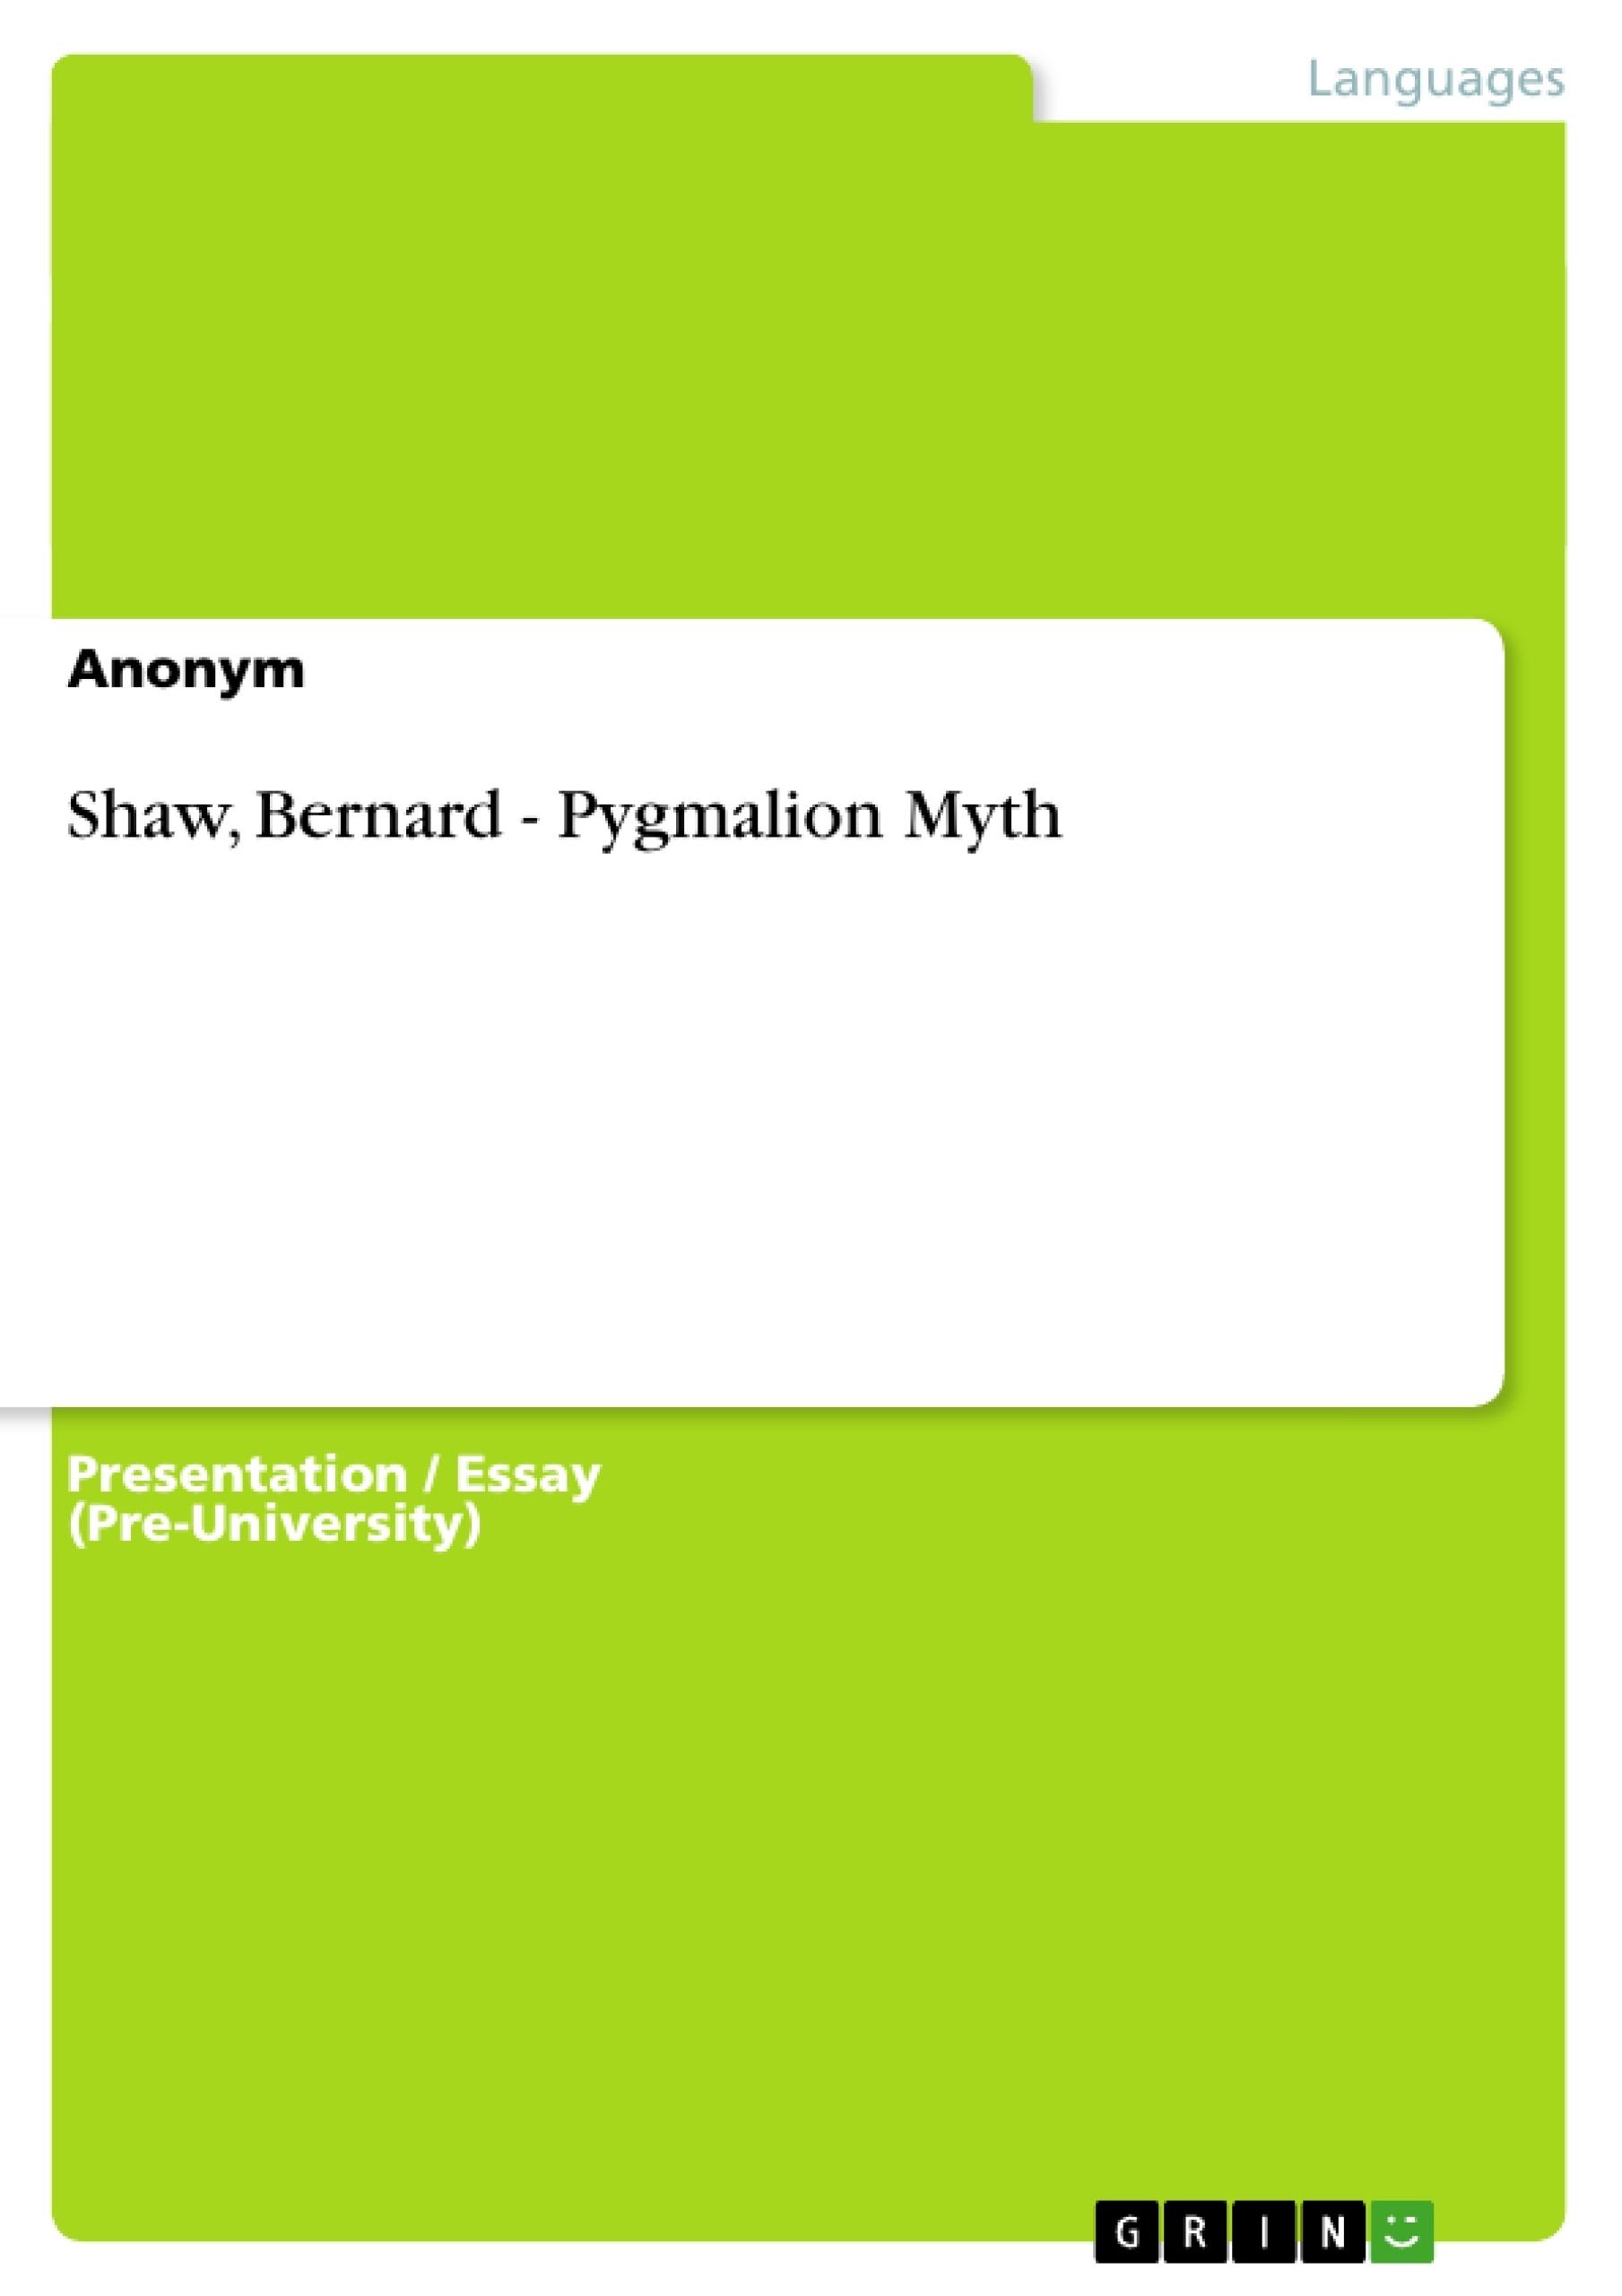 Title: Shaw, Bernard - Pygmalion Myth